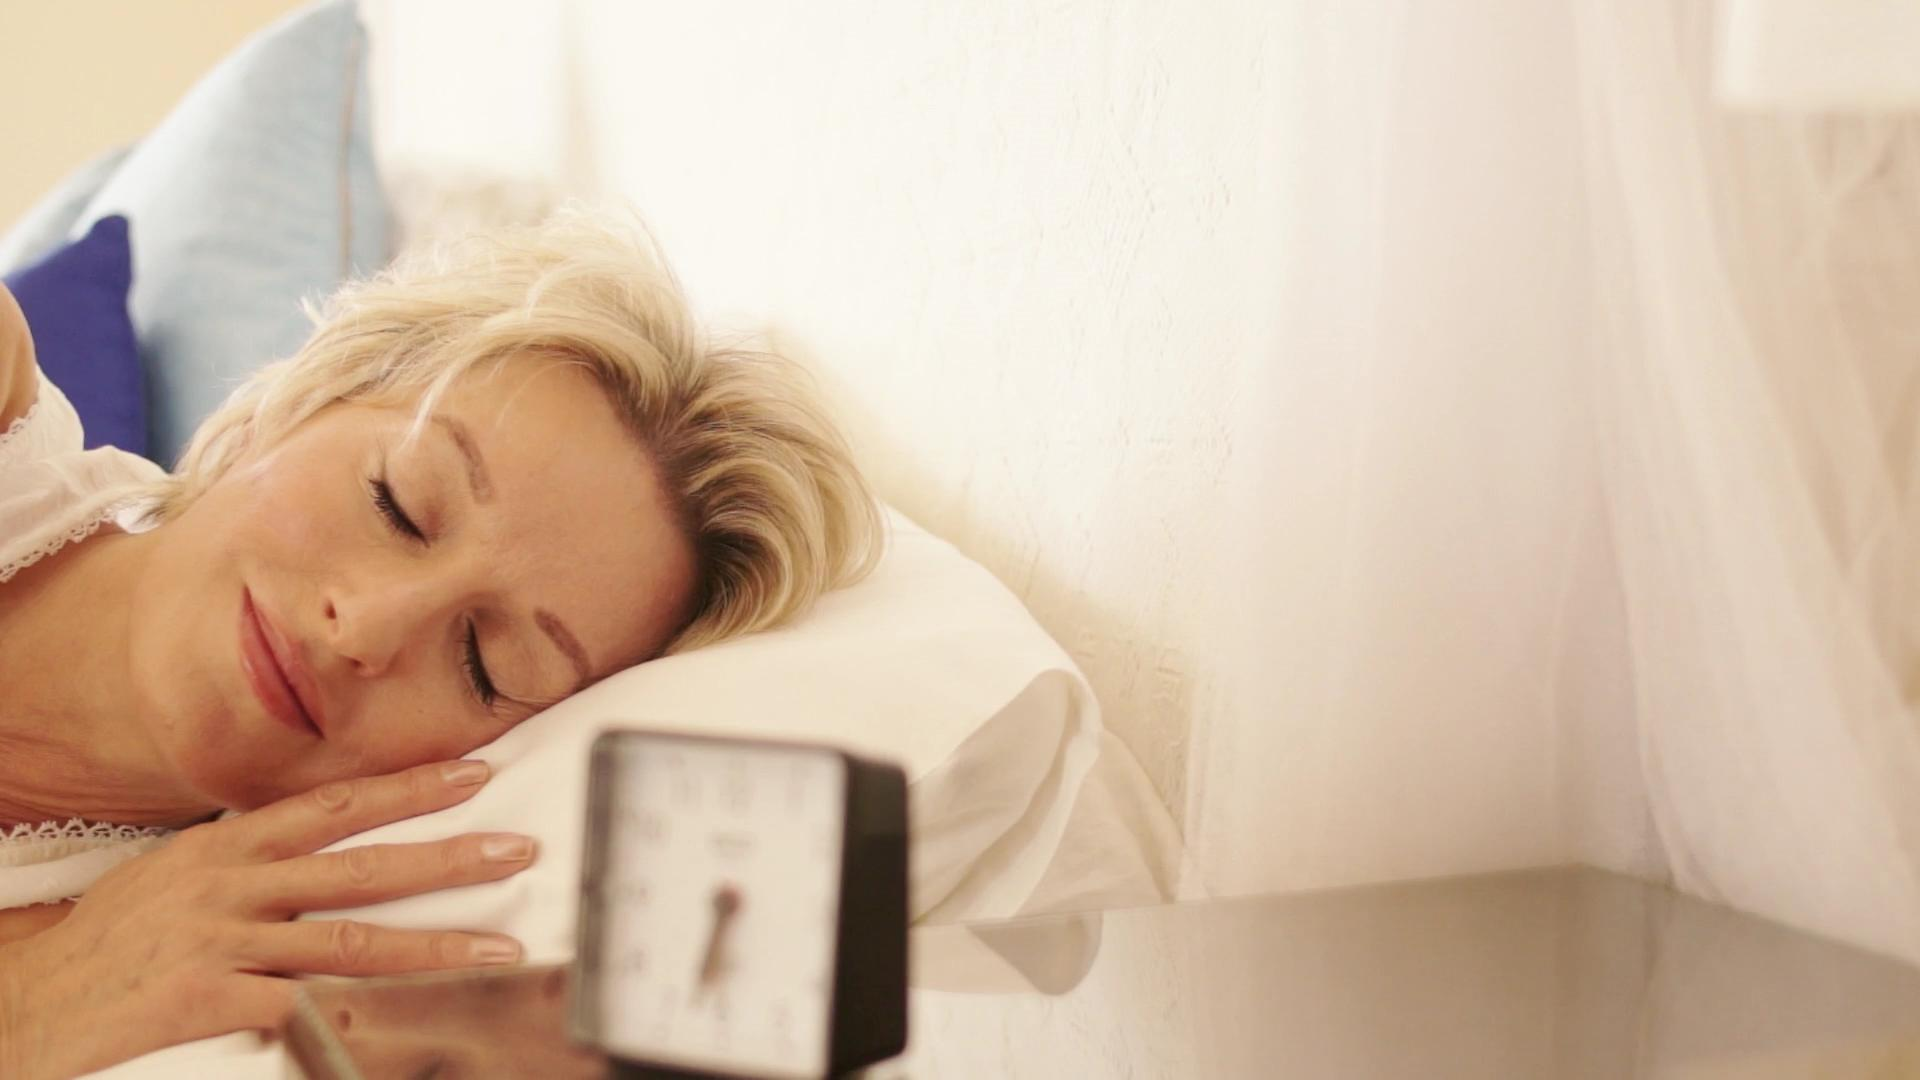 7 Foods That Help You Sleep